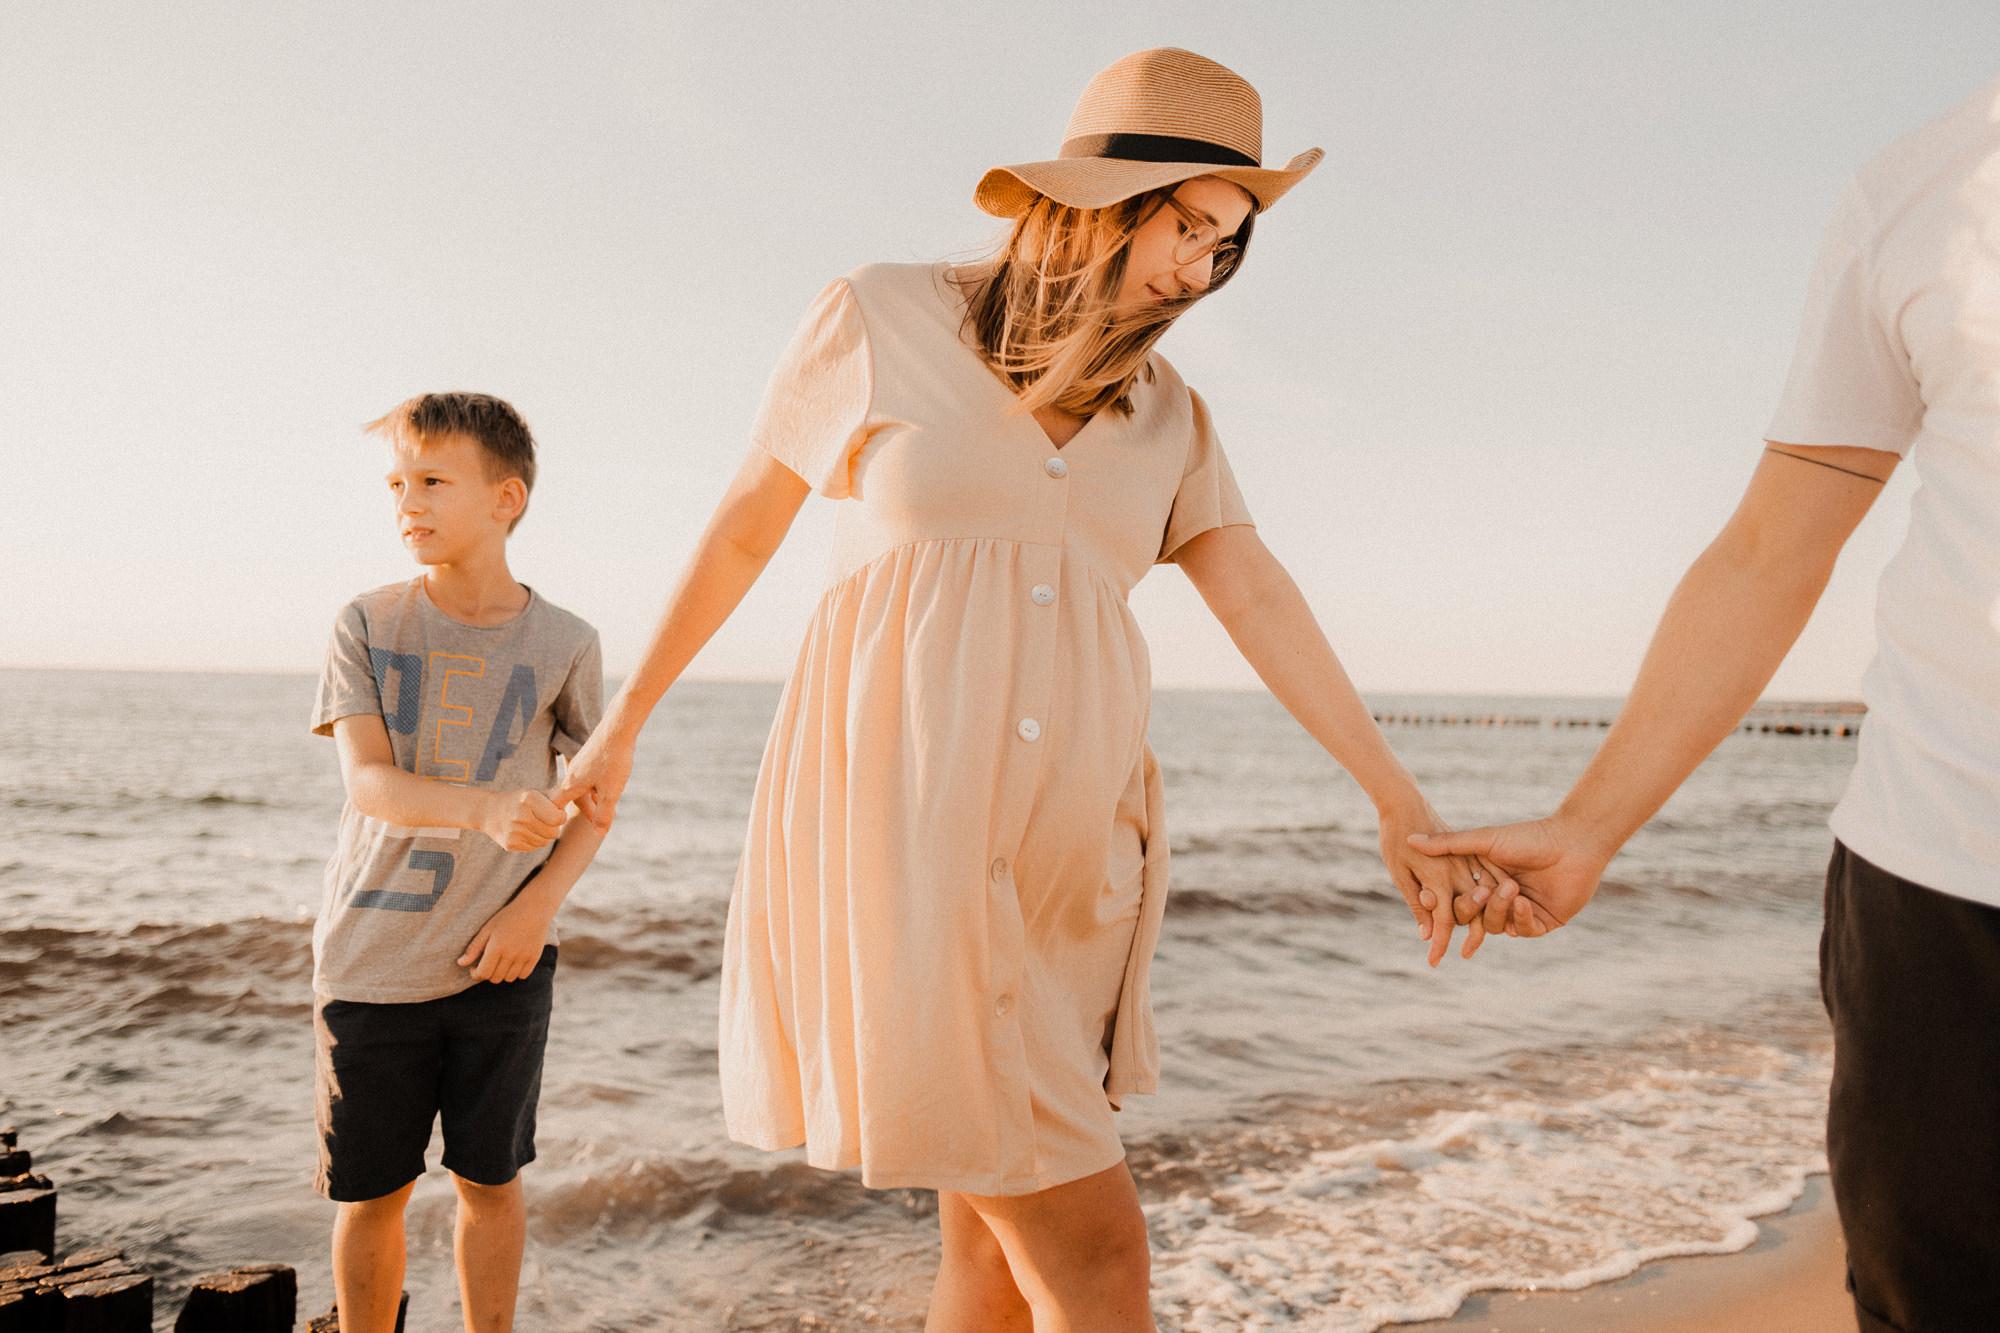 Familienshooting in Wustrow - Familienportraits auf dem Darß - Familienfotograf Dierhagen - Fotoshooting in Zingst am Strand